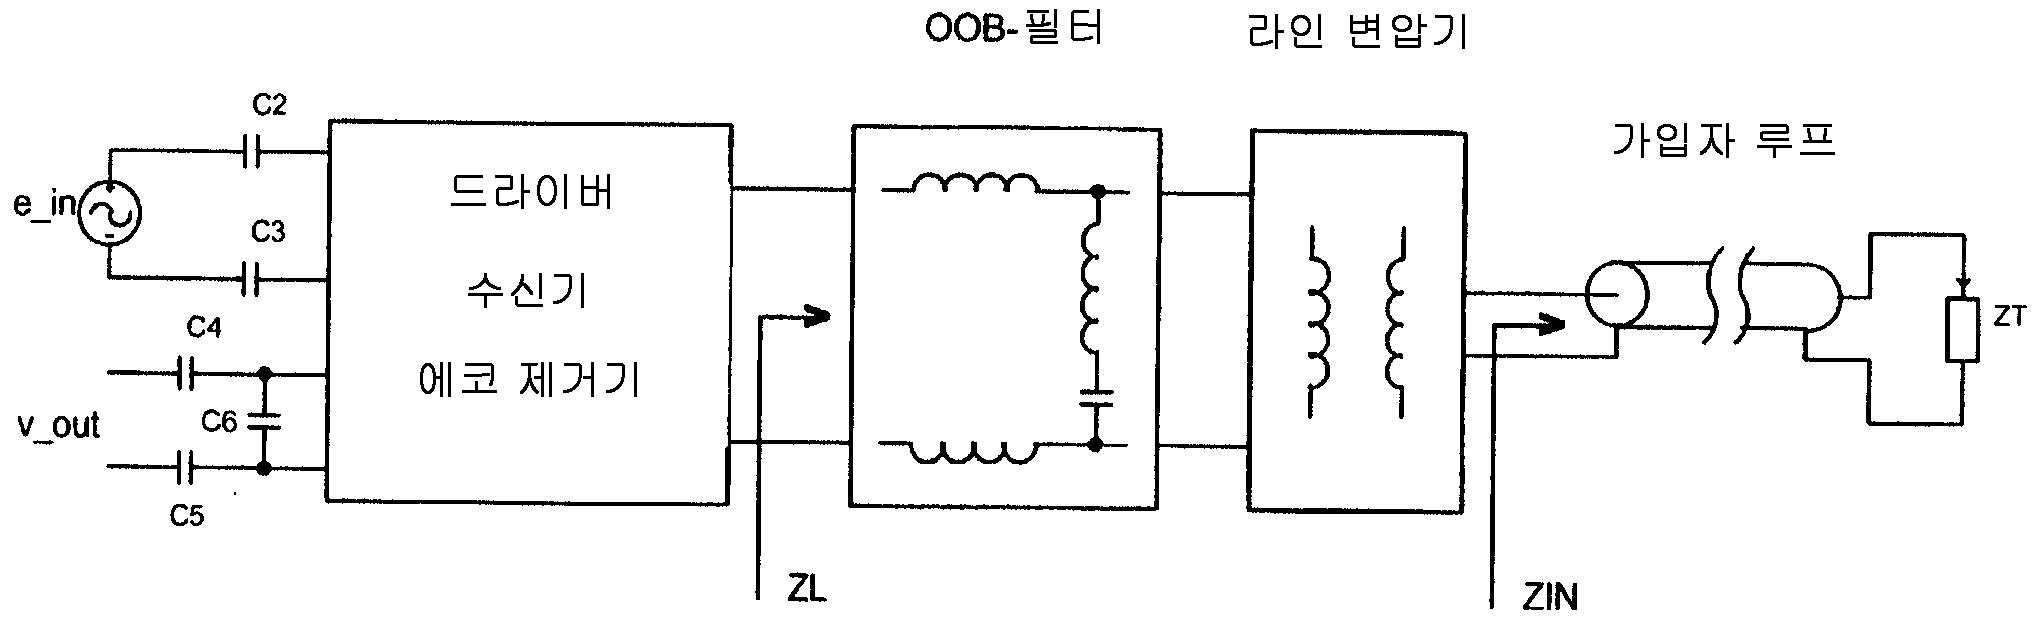 Figure 112005064997734-pct00005